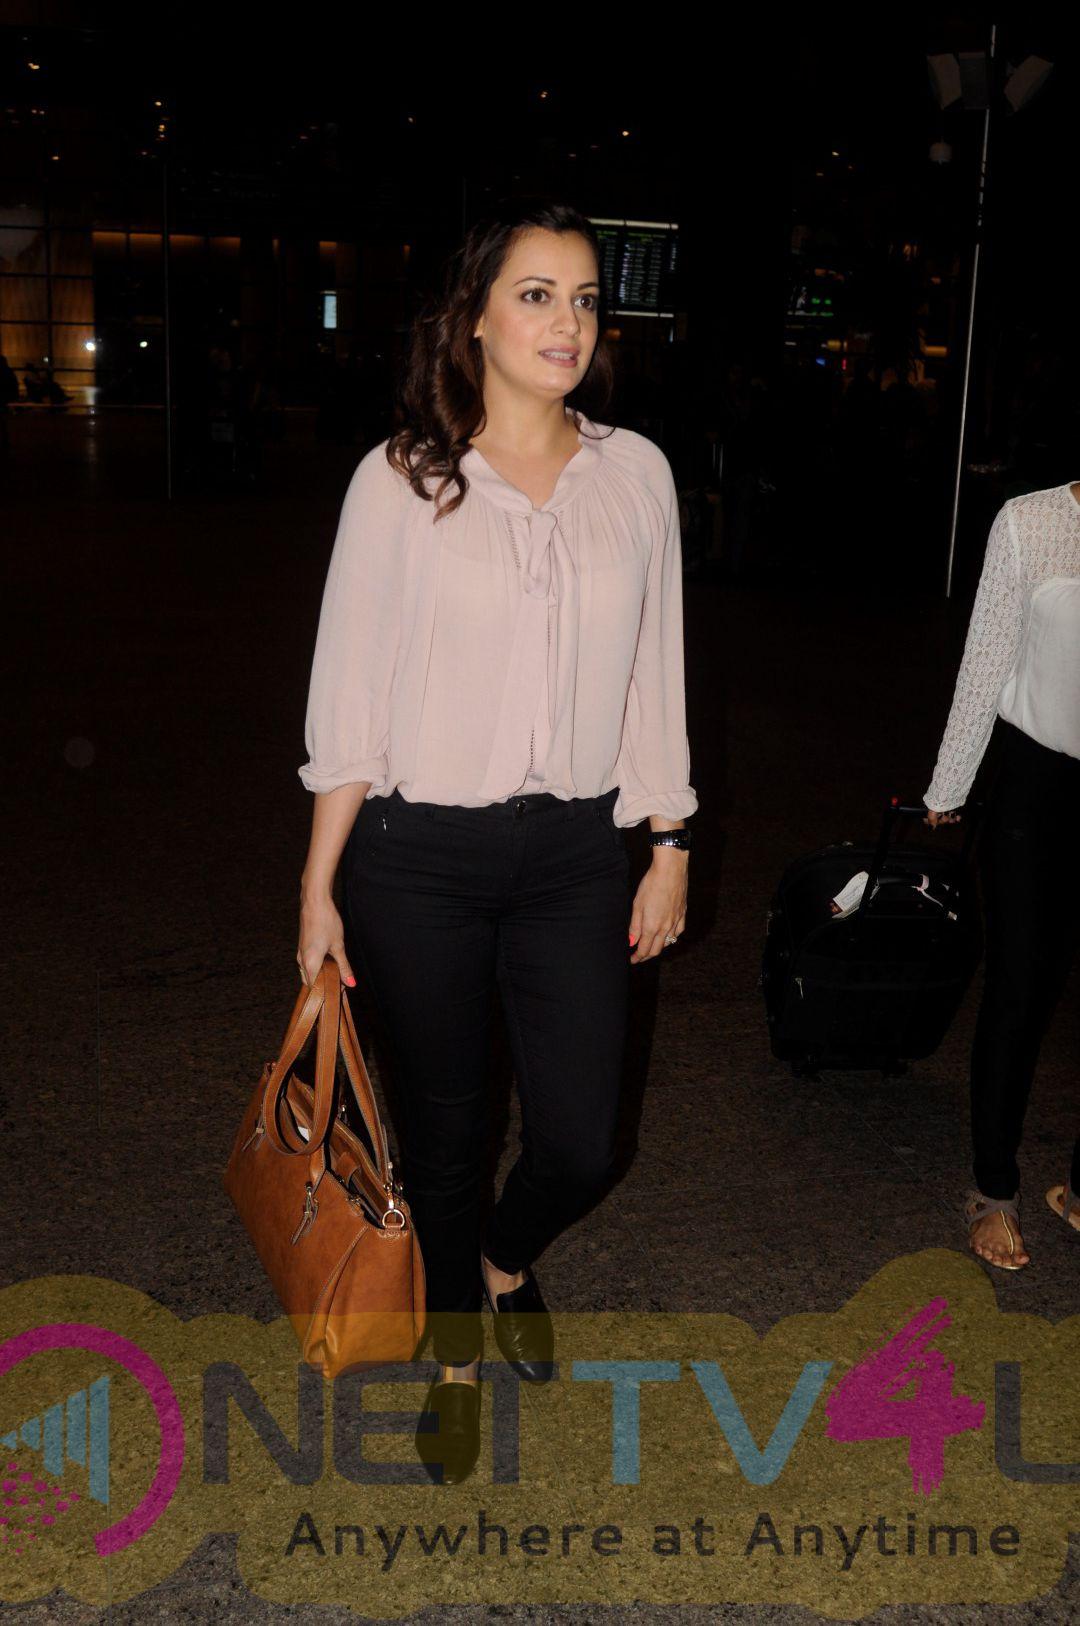 Dia Mirza & Aishwarya Rai & Lara Dutta & Sonam Kapoor Spotted At Airport Photos